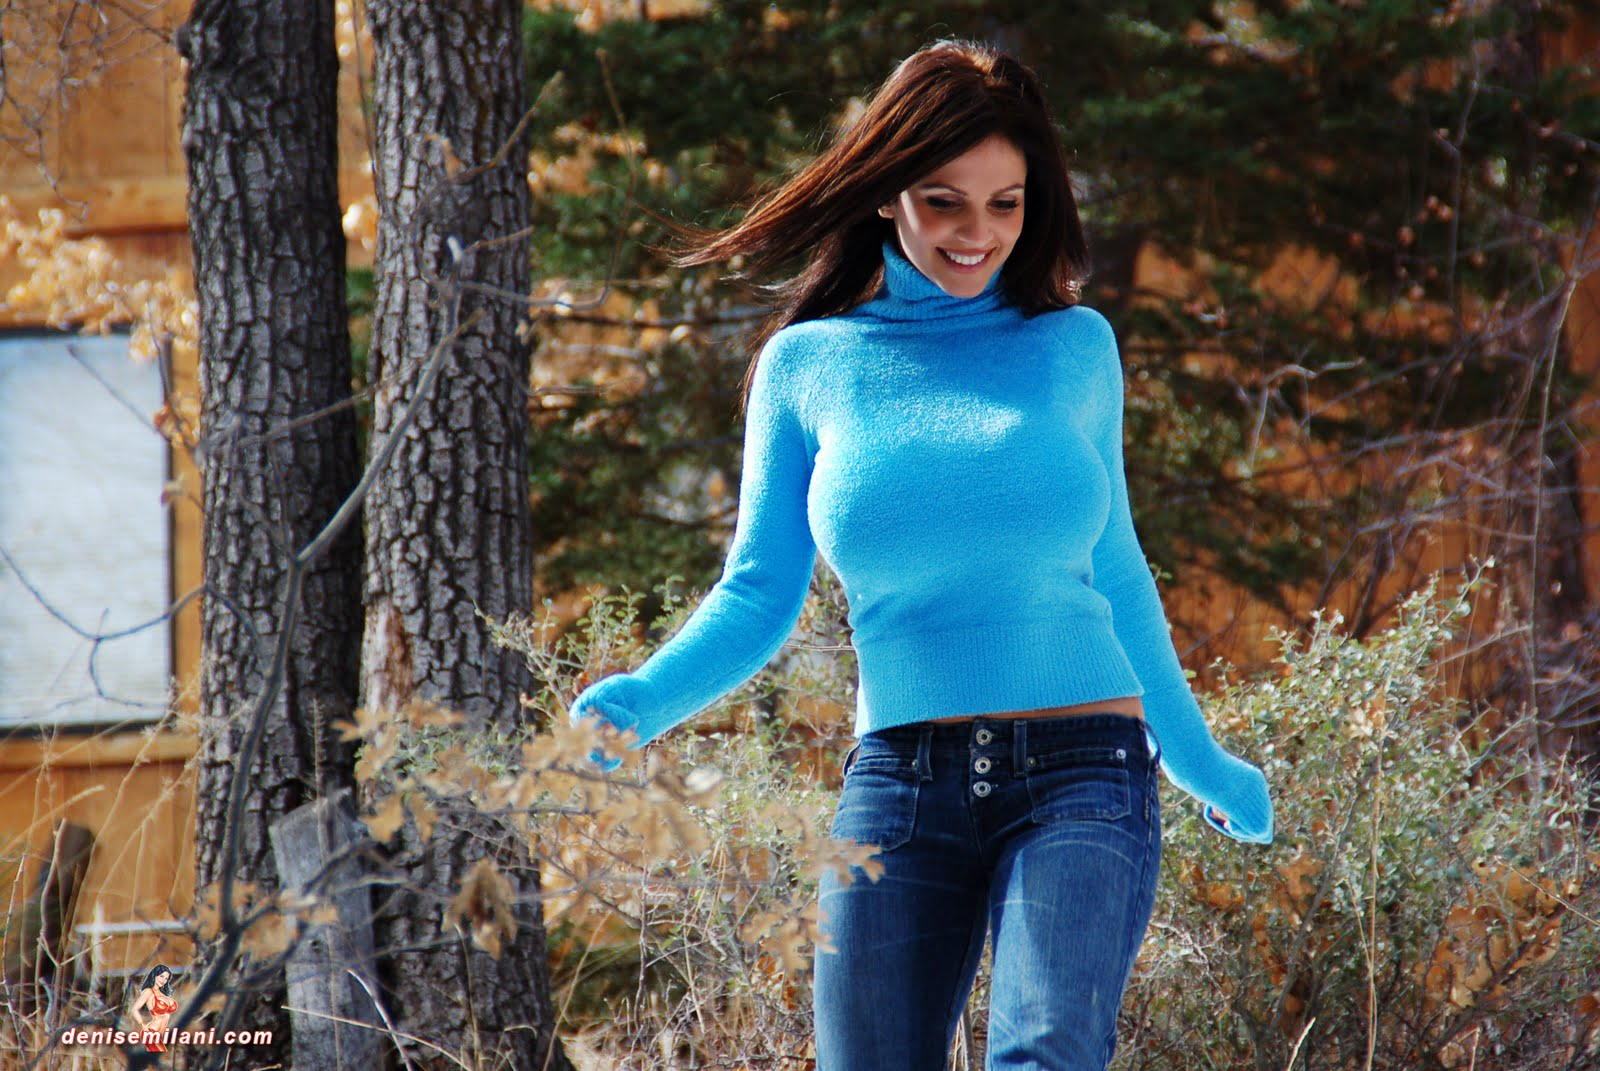 denise milani blue dress - photo #21